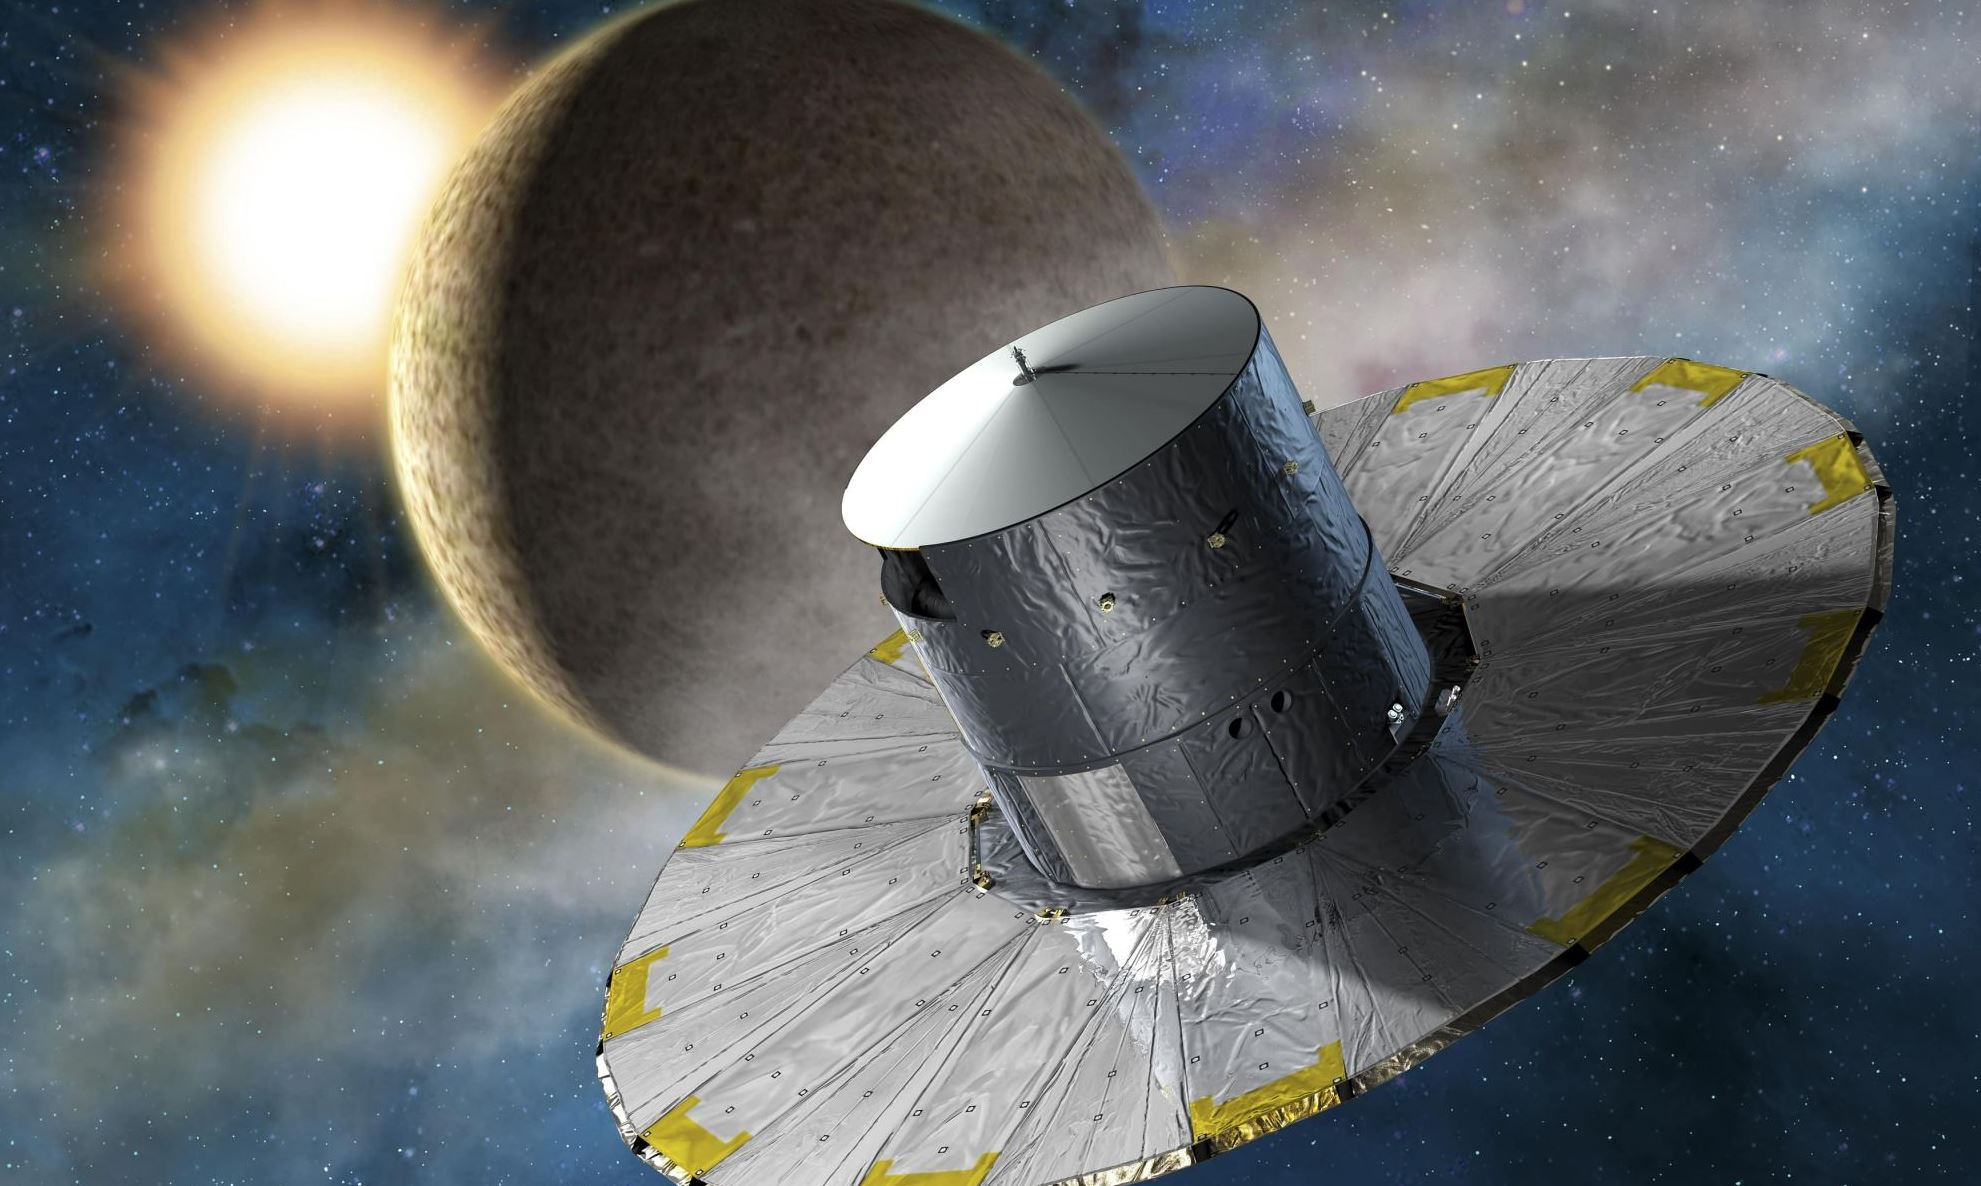 Image Credit: European Space Agency - D. Ducros